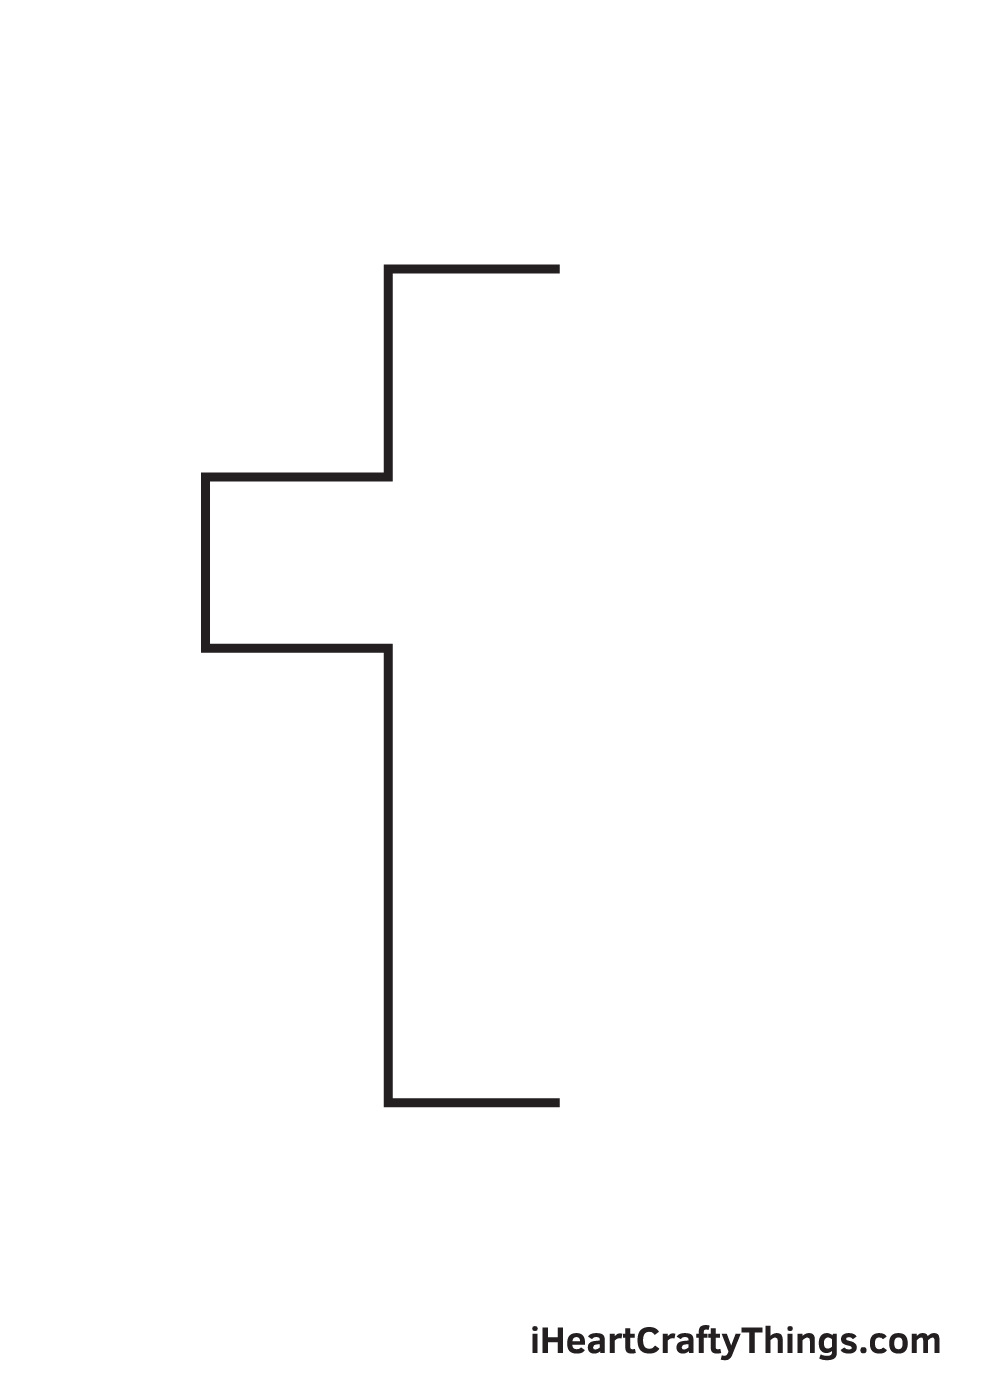 cross drawing - step 3